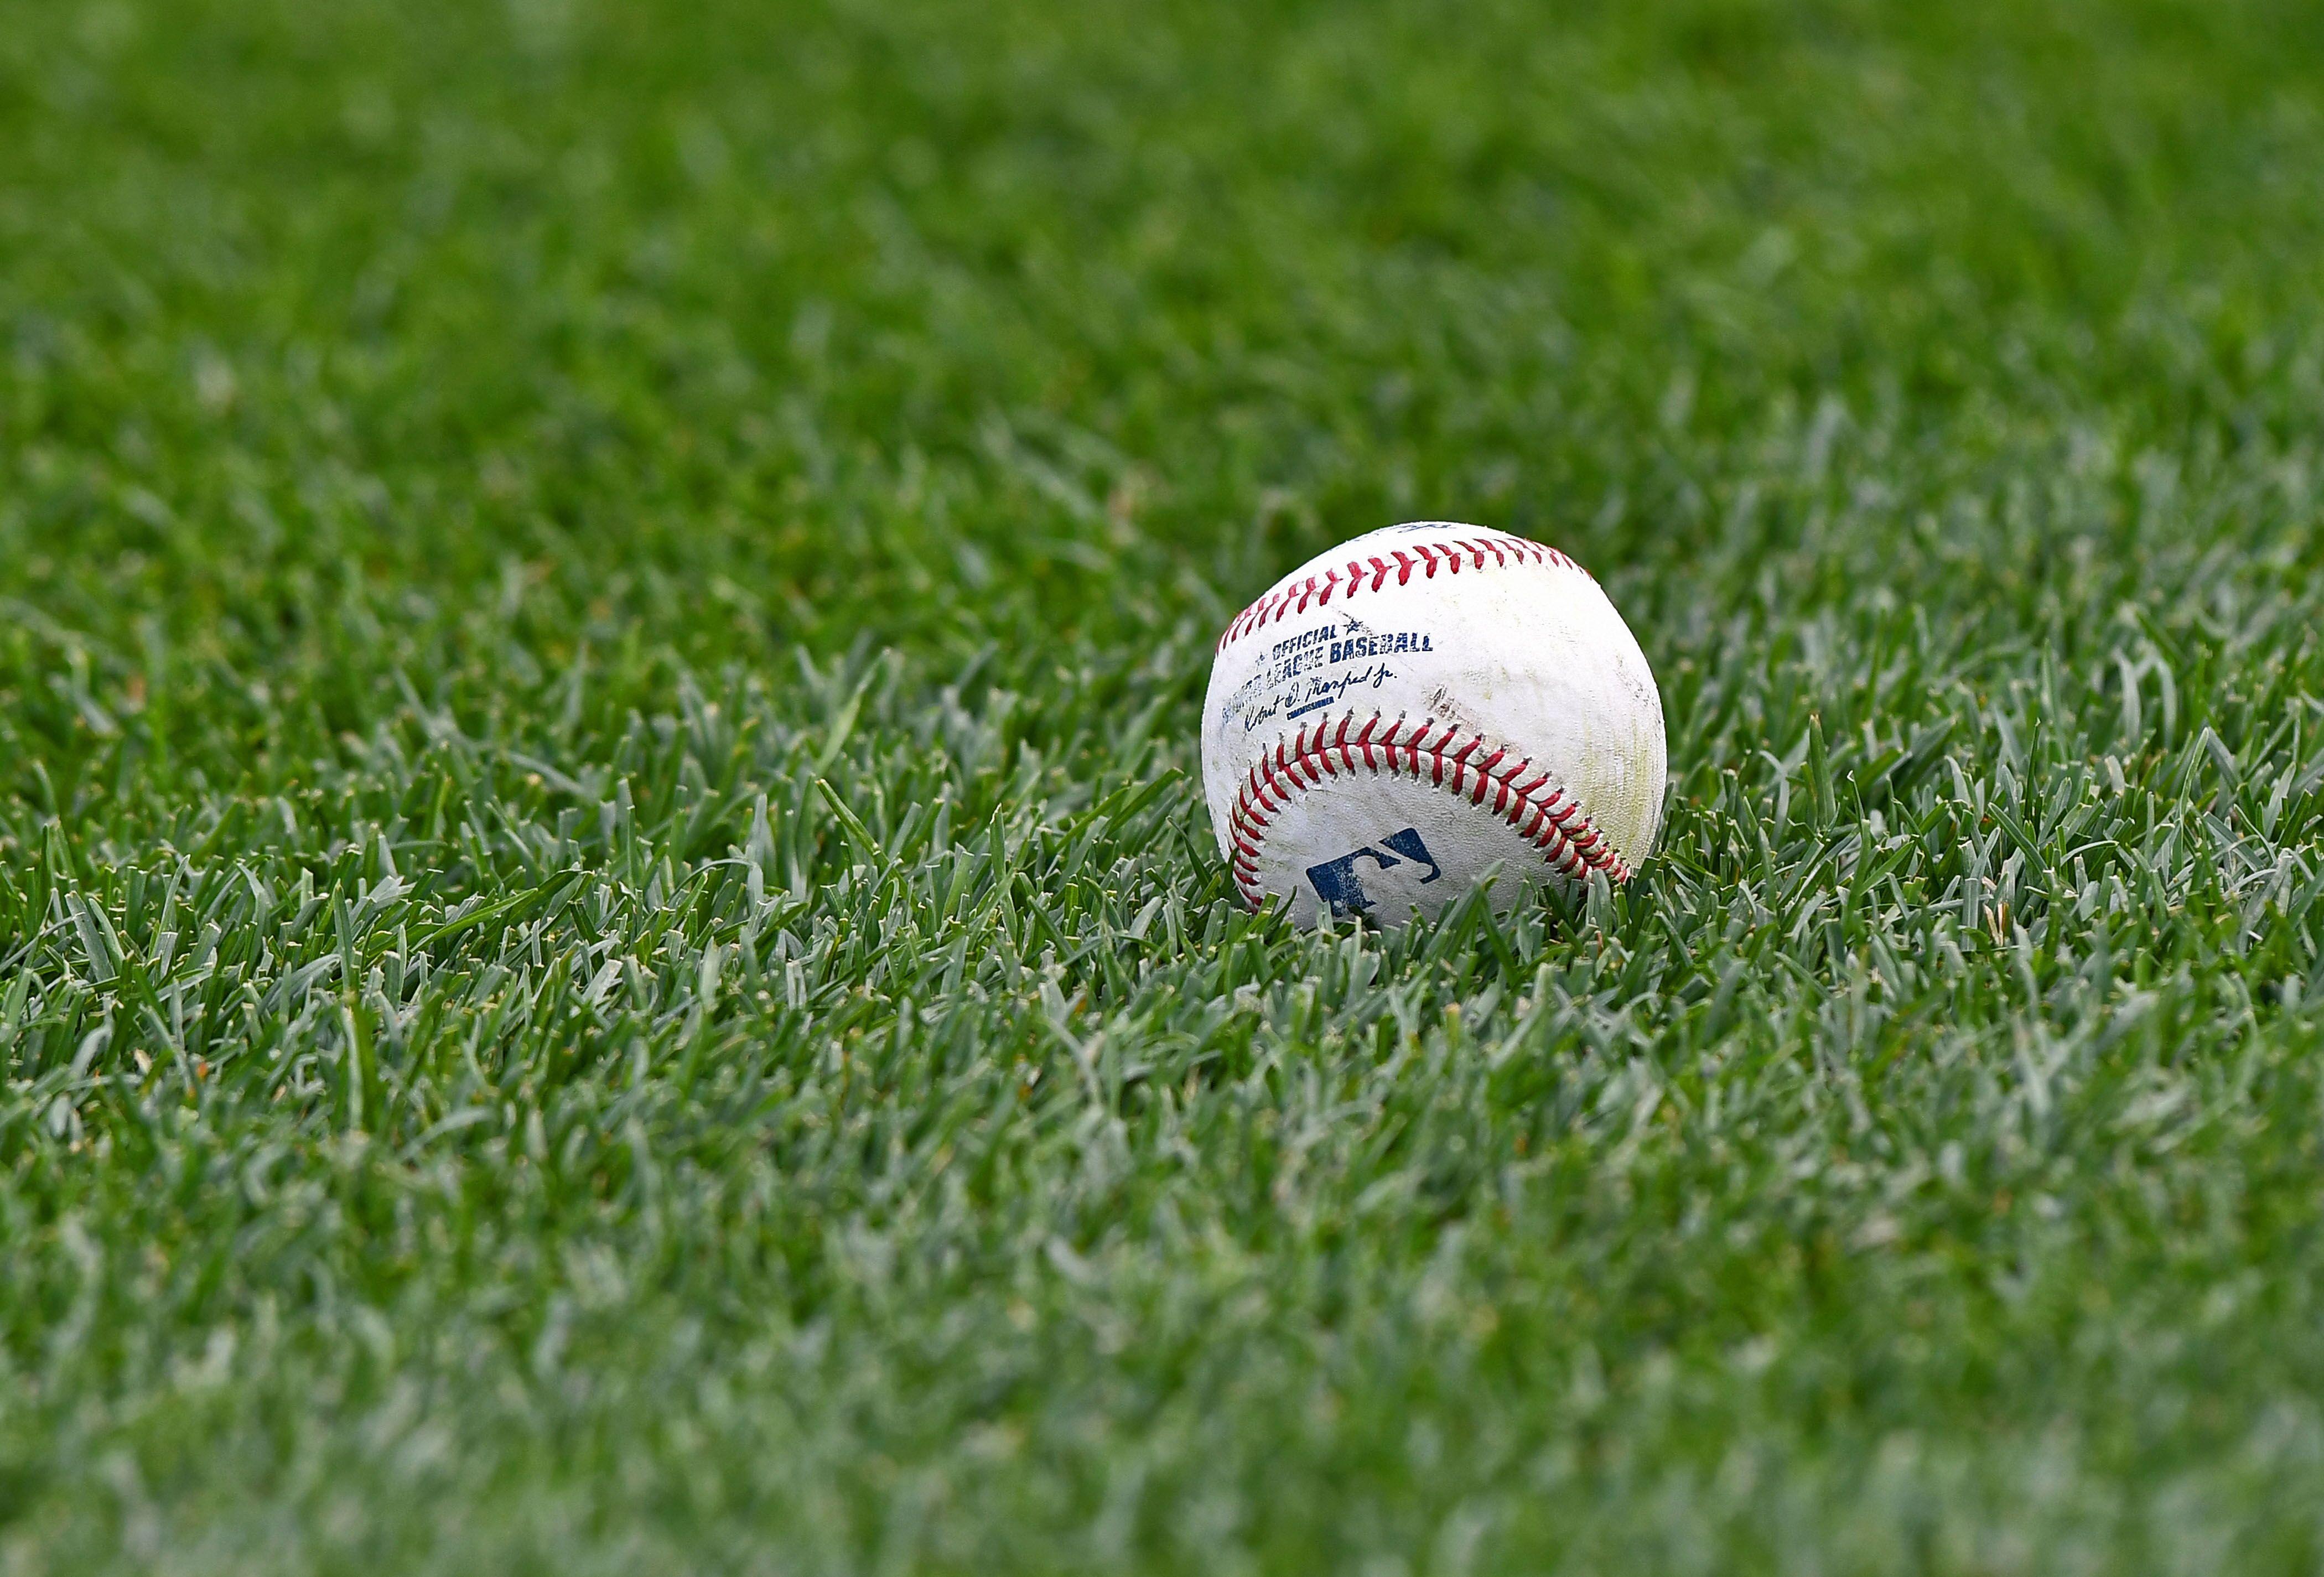 MLB: It's always good to keep an eye on the basement